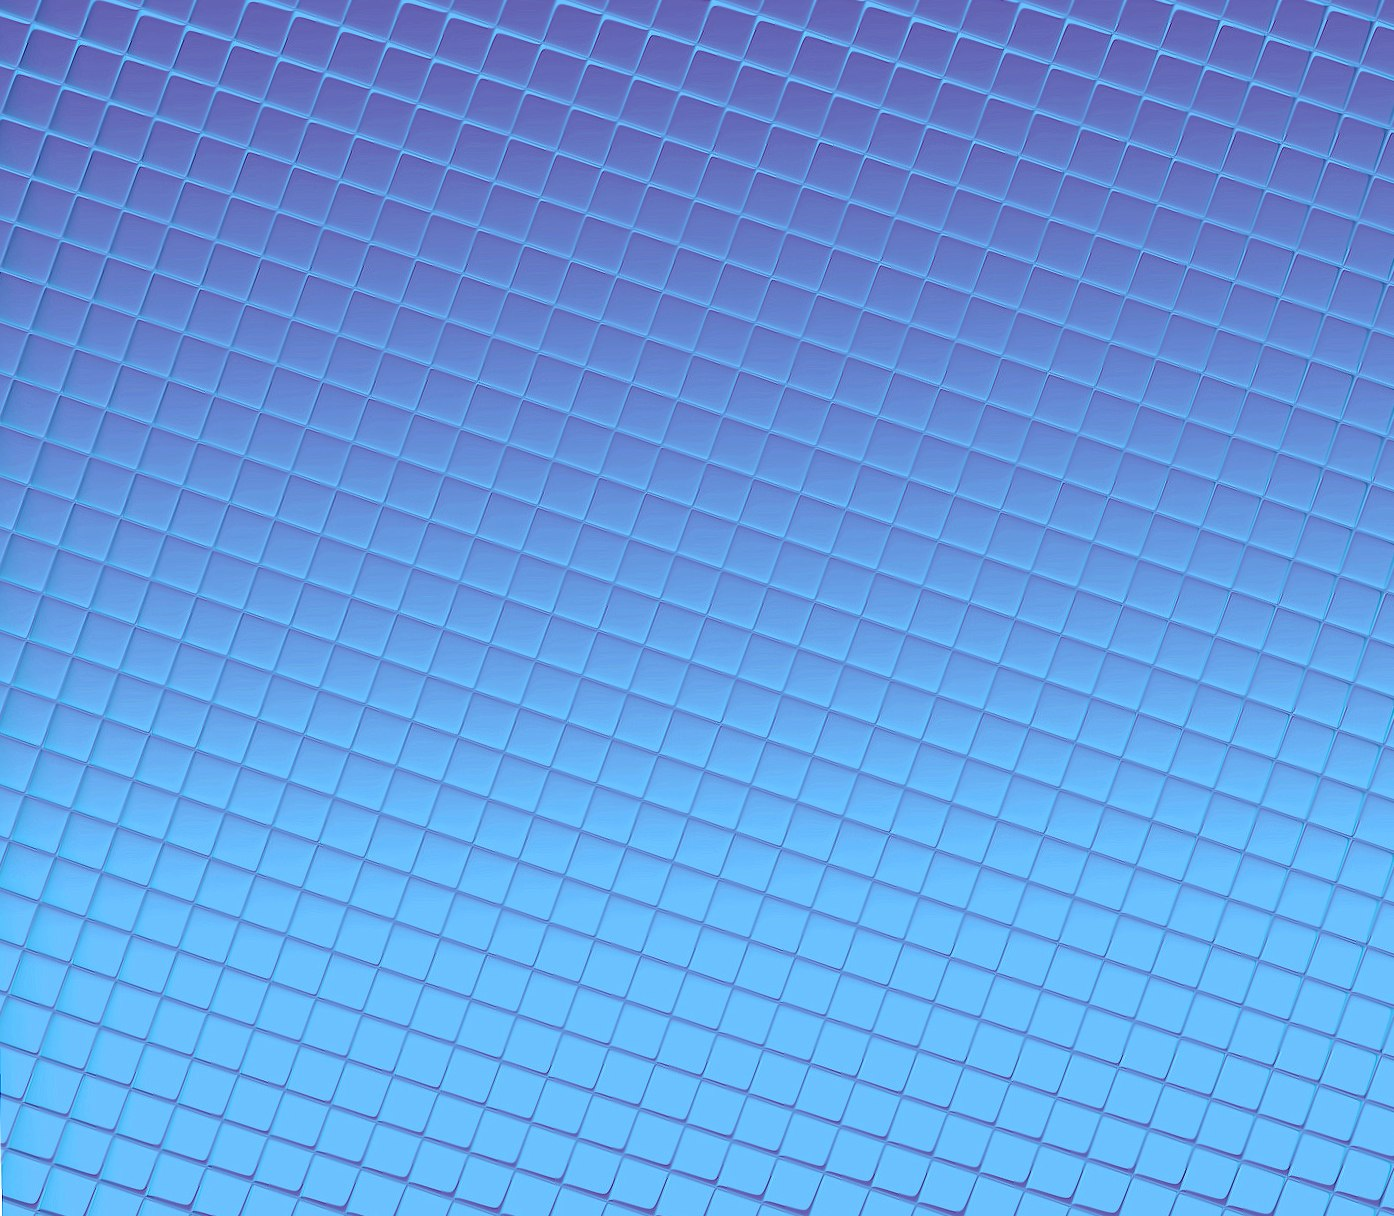 Display Blox 2018 wallpapers HD quality